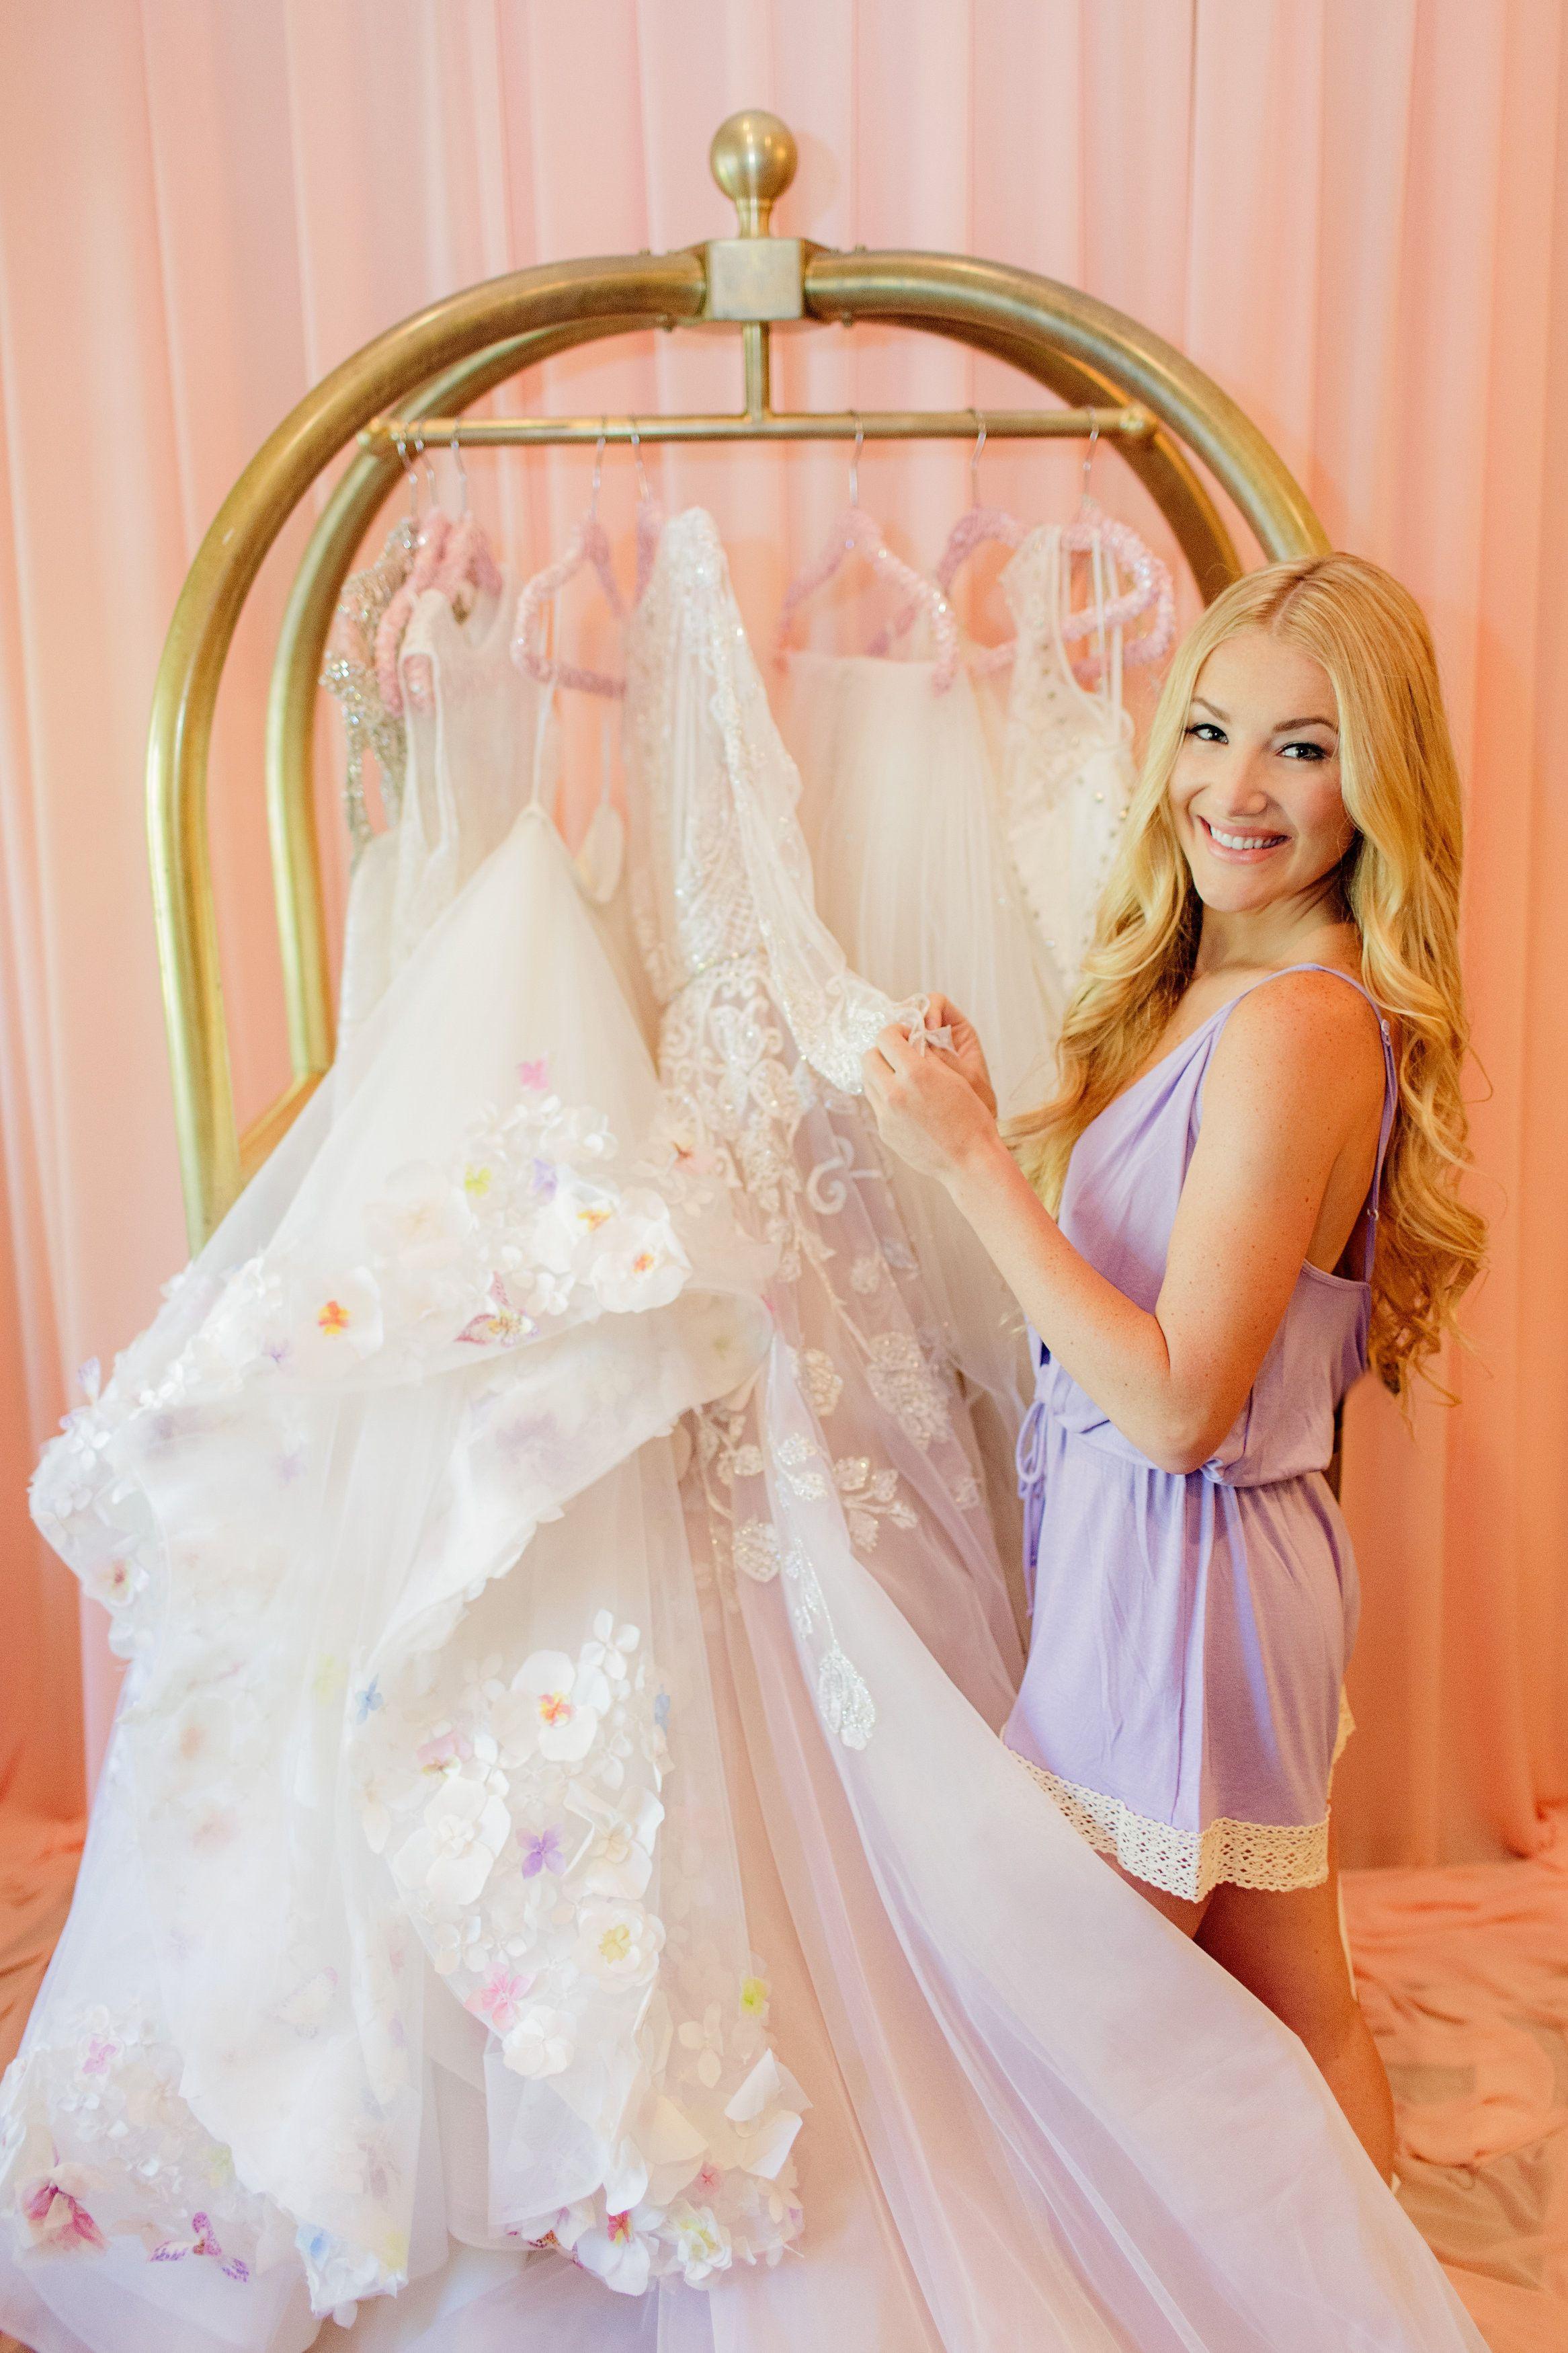 Hayley Paige Wedding dresses kleinfeld, Wedding dress